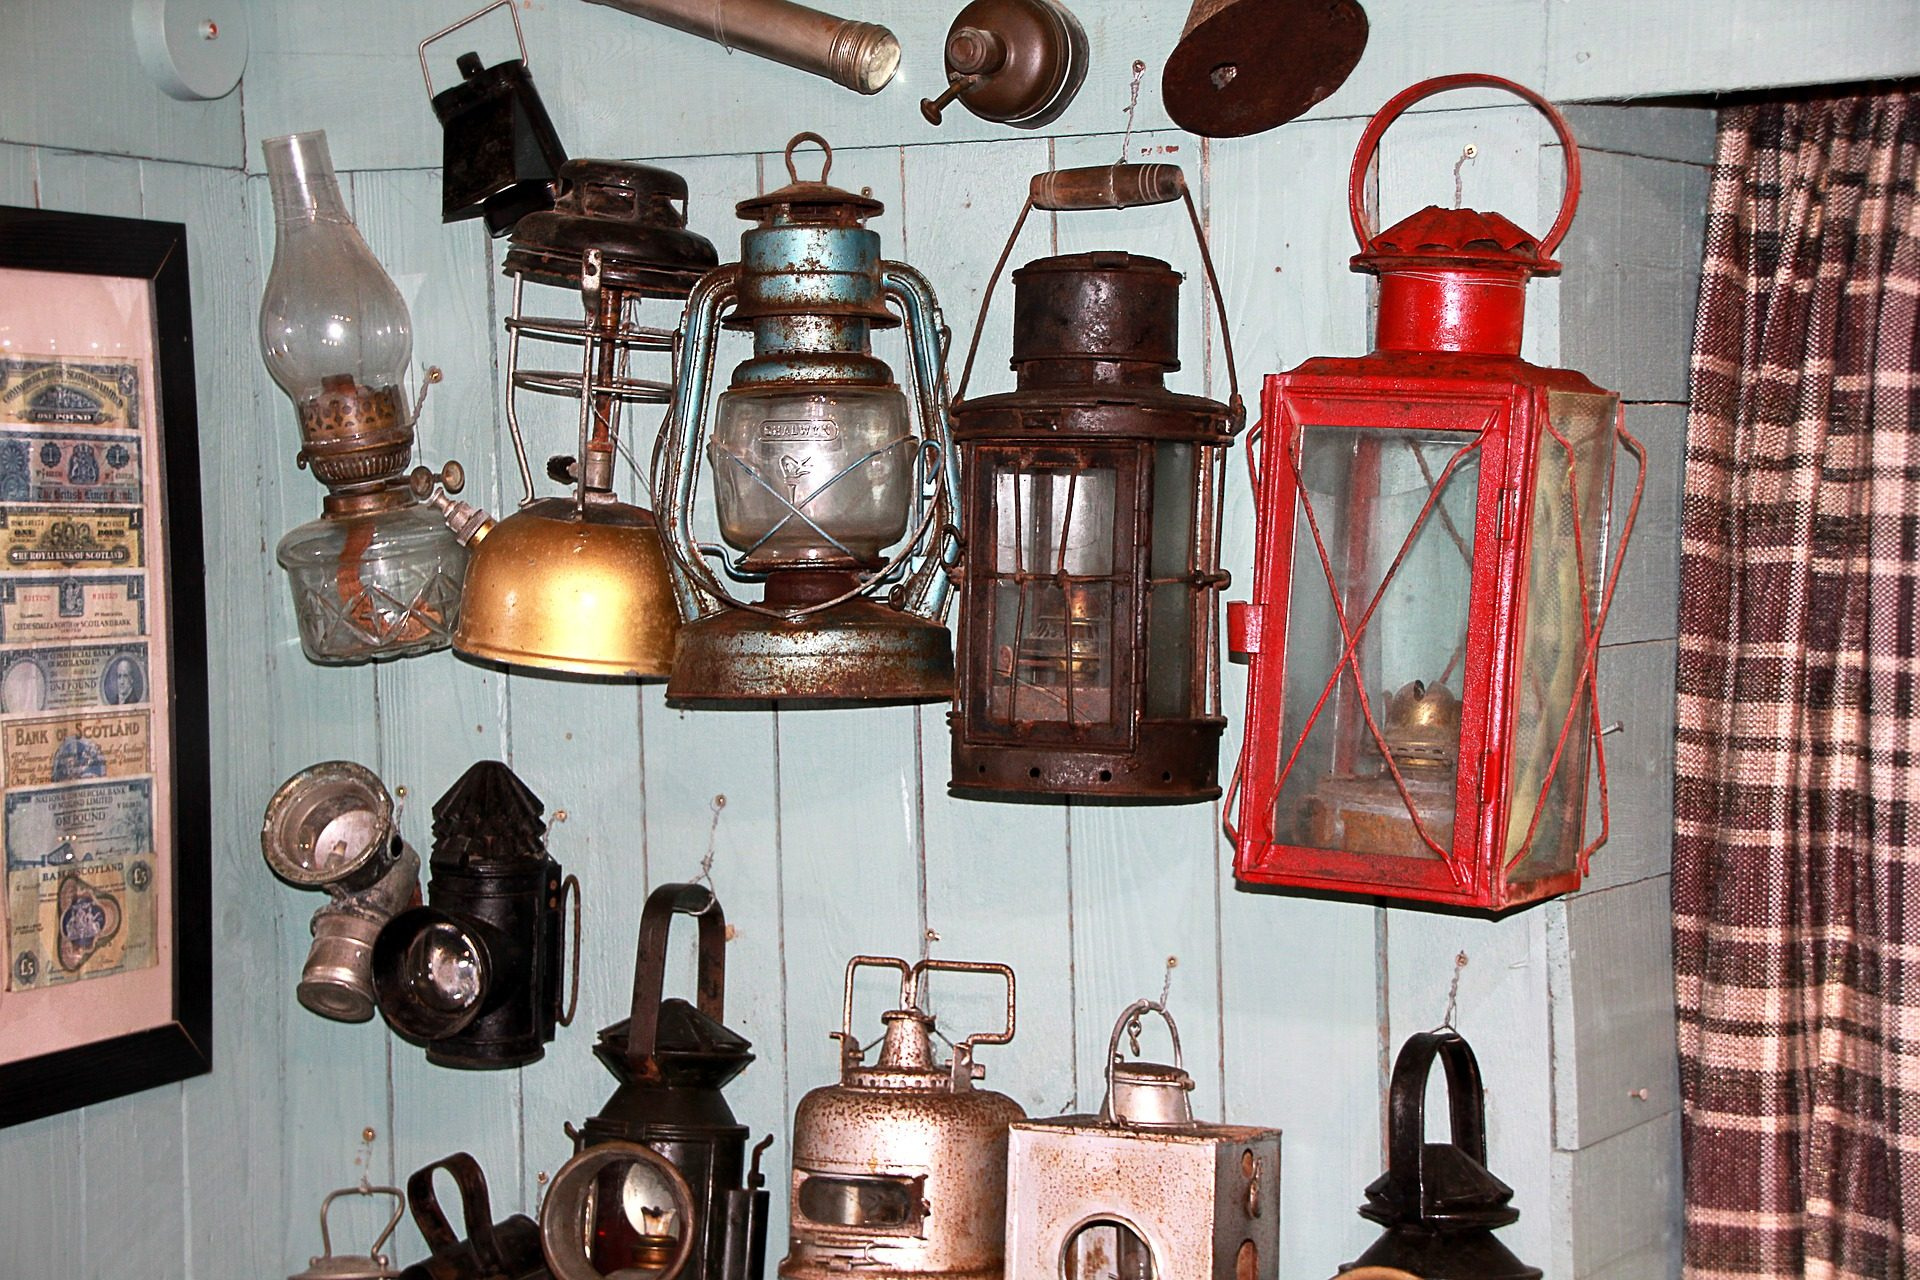 lanternas, lámparas, lâmpadas, Colección, velho, vintage - Papéis de parede HD - Professor-falken.com